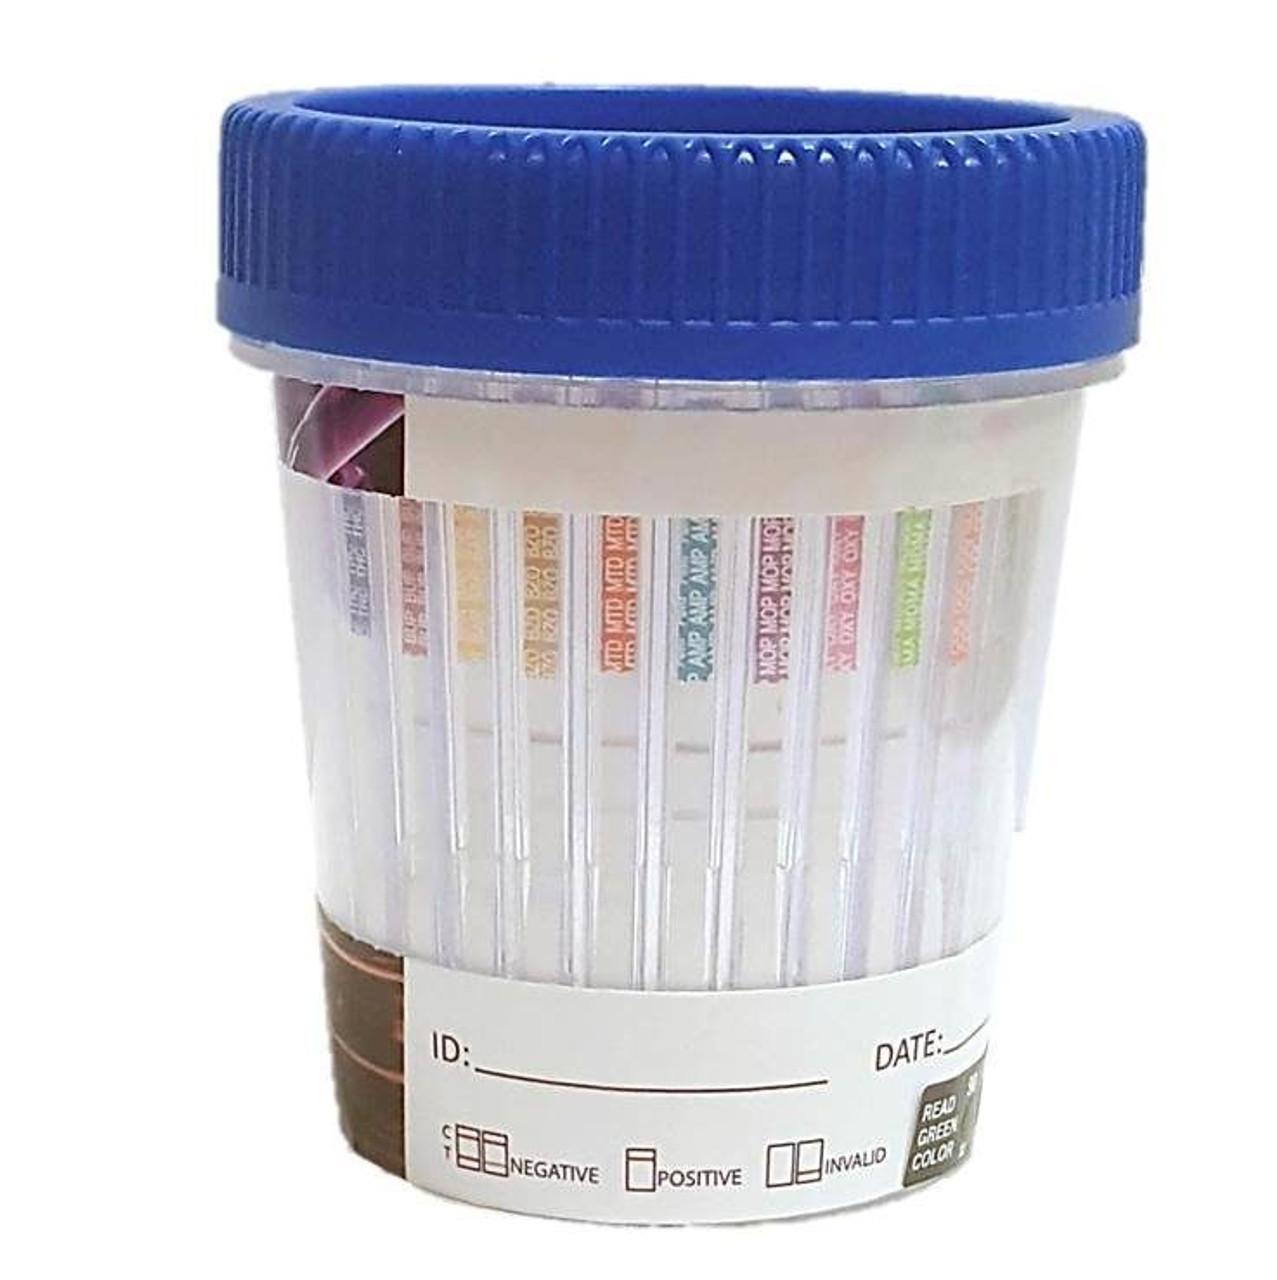 12 Panel Urine Drug Tapered Test Cup 25/box